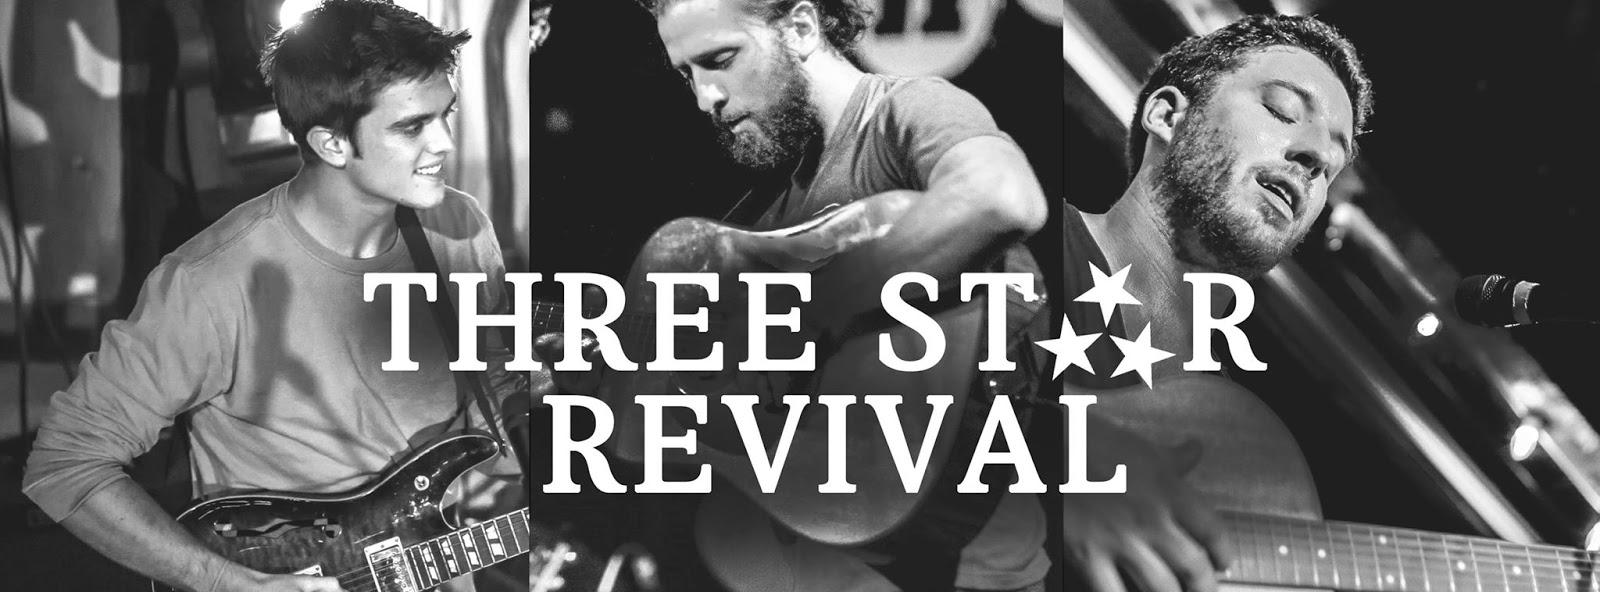 three star revival